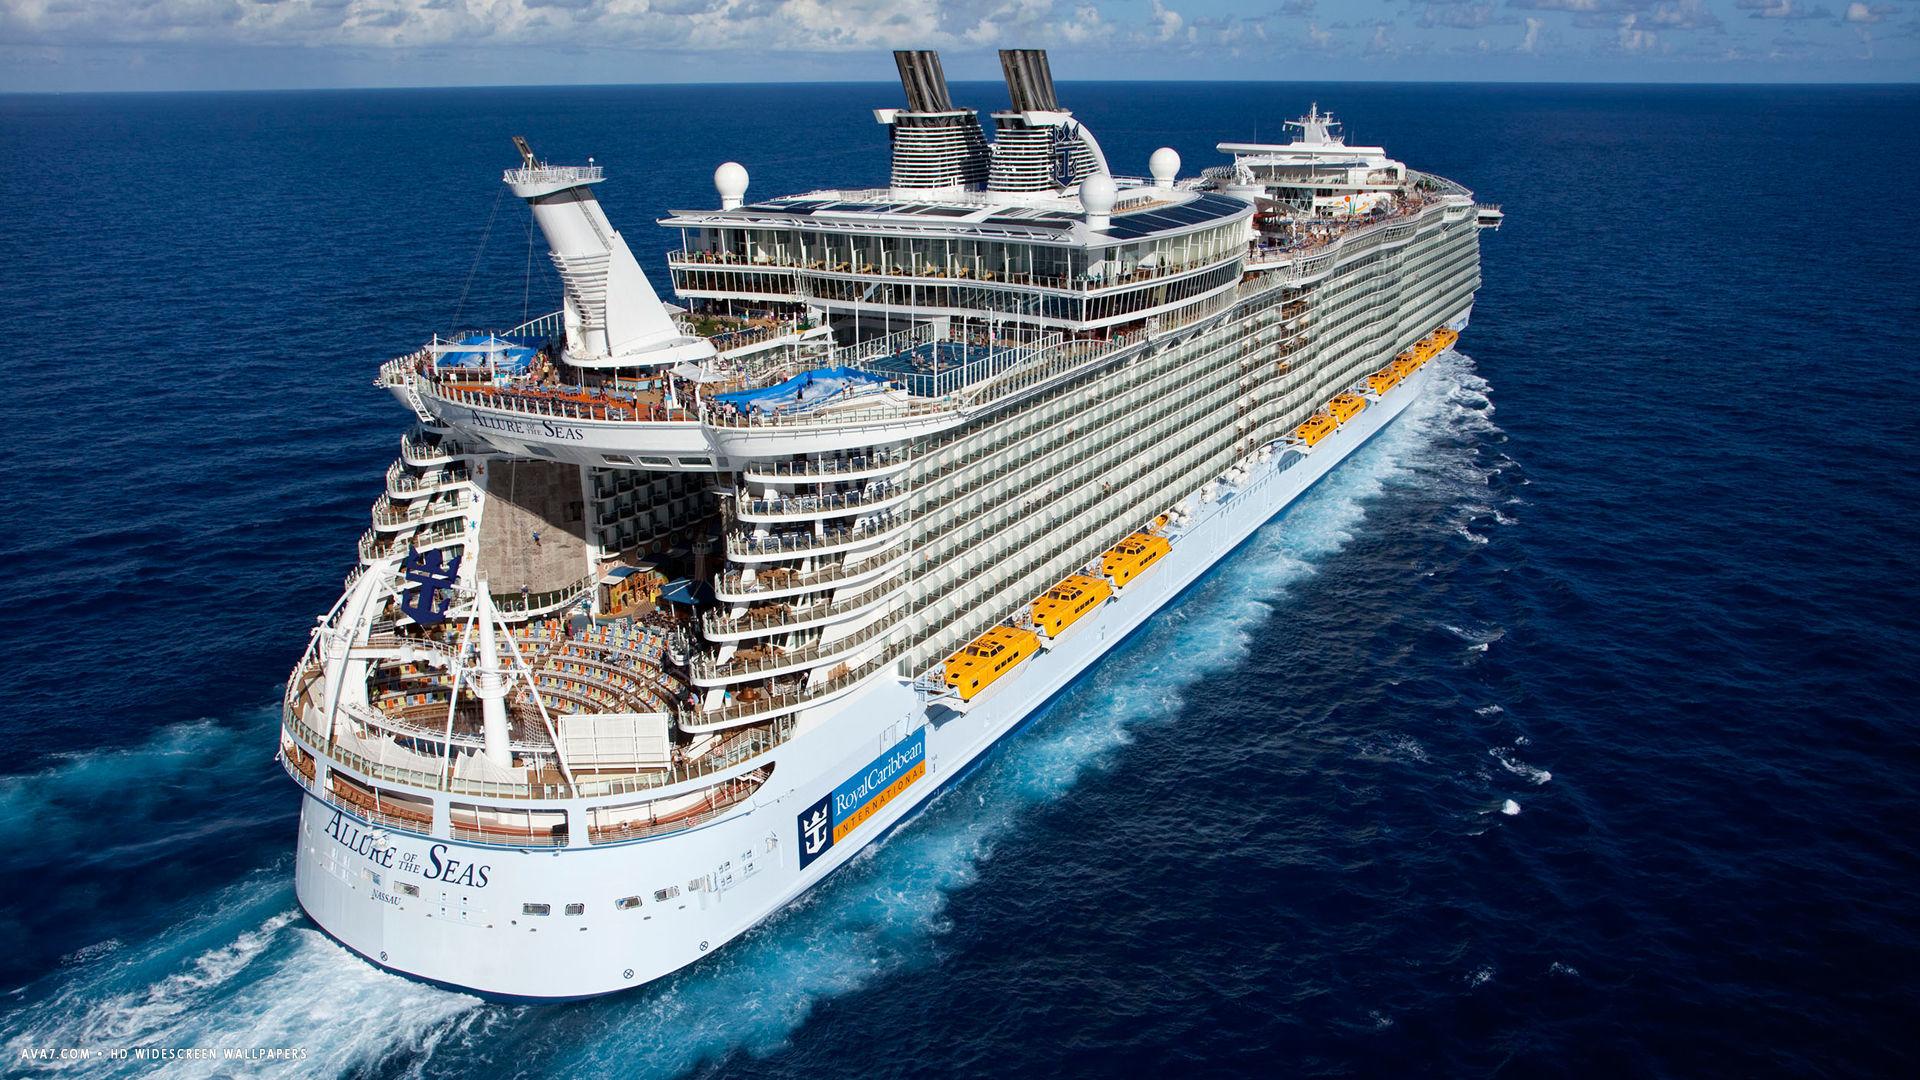 Let's talk Cruises!